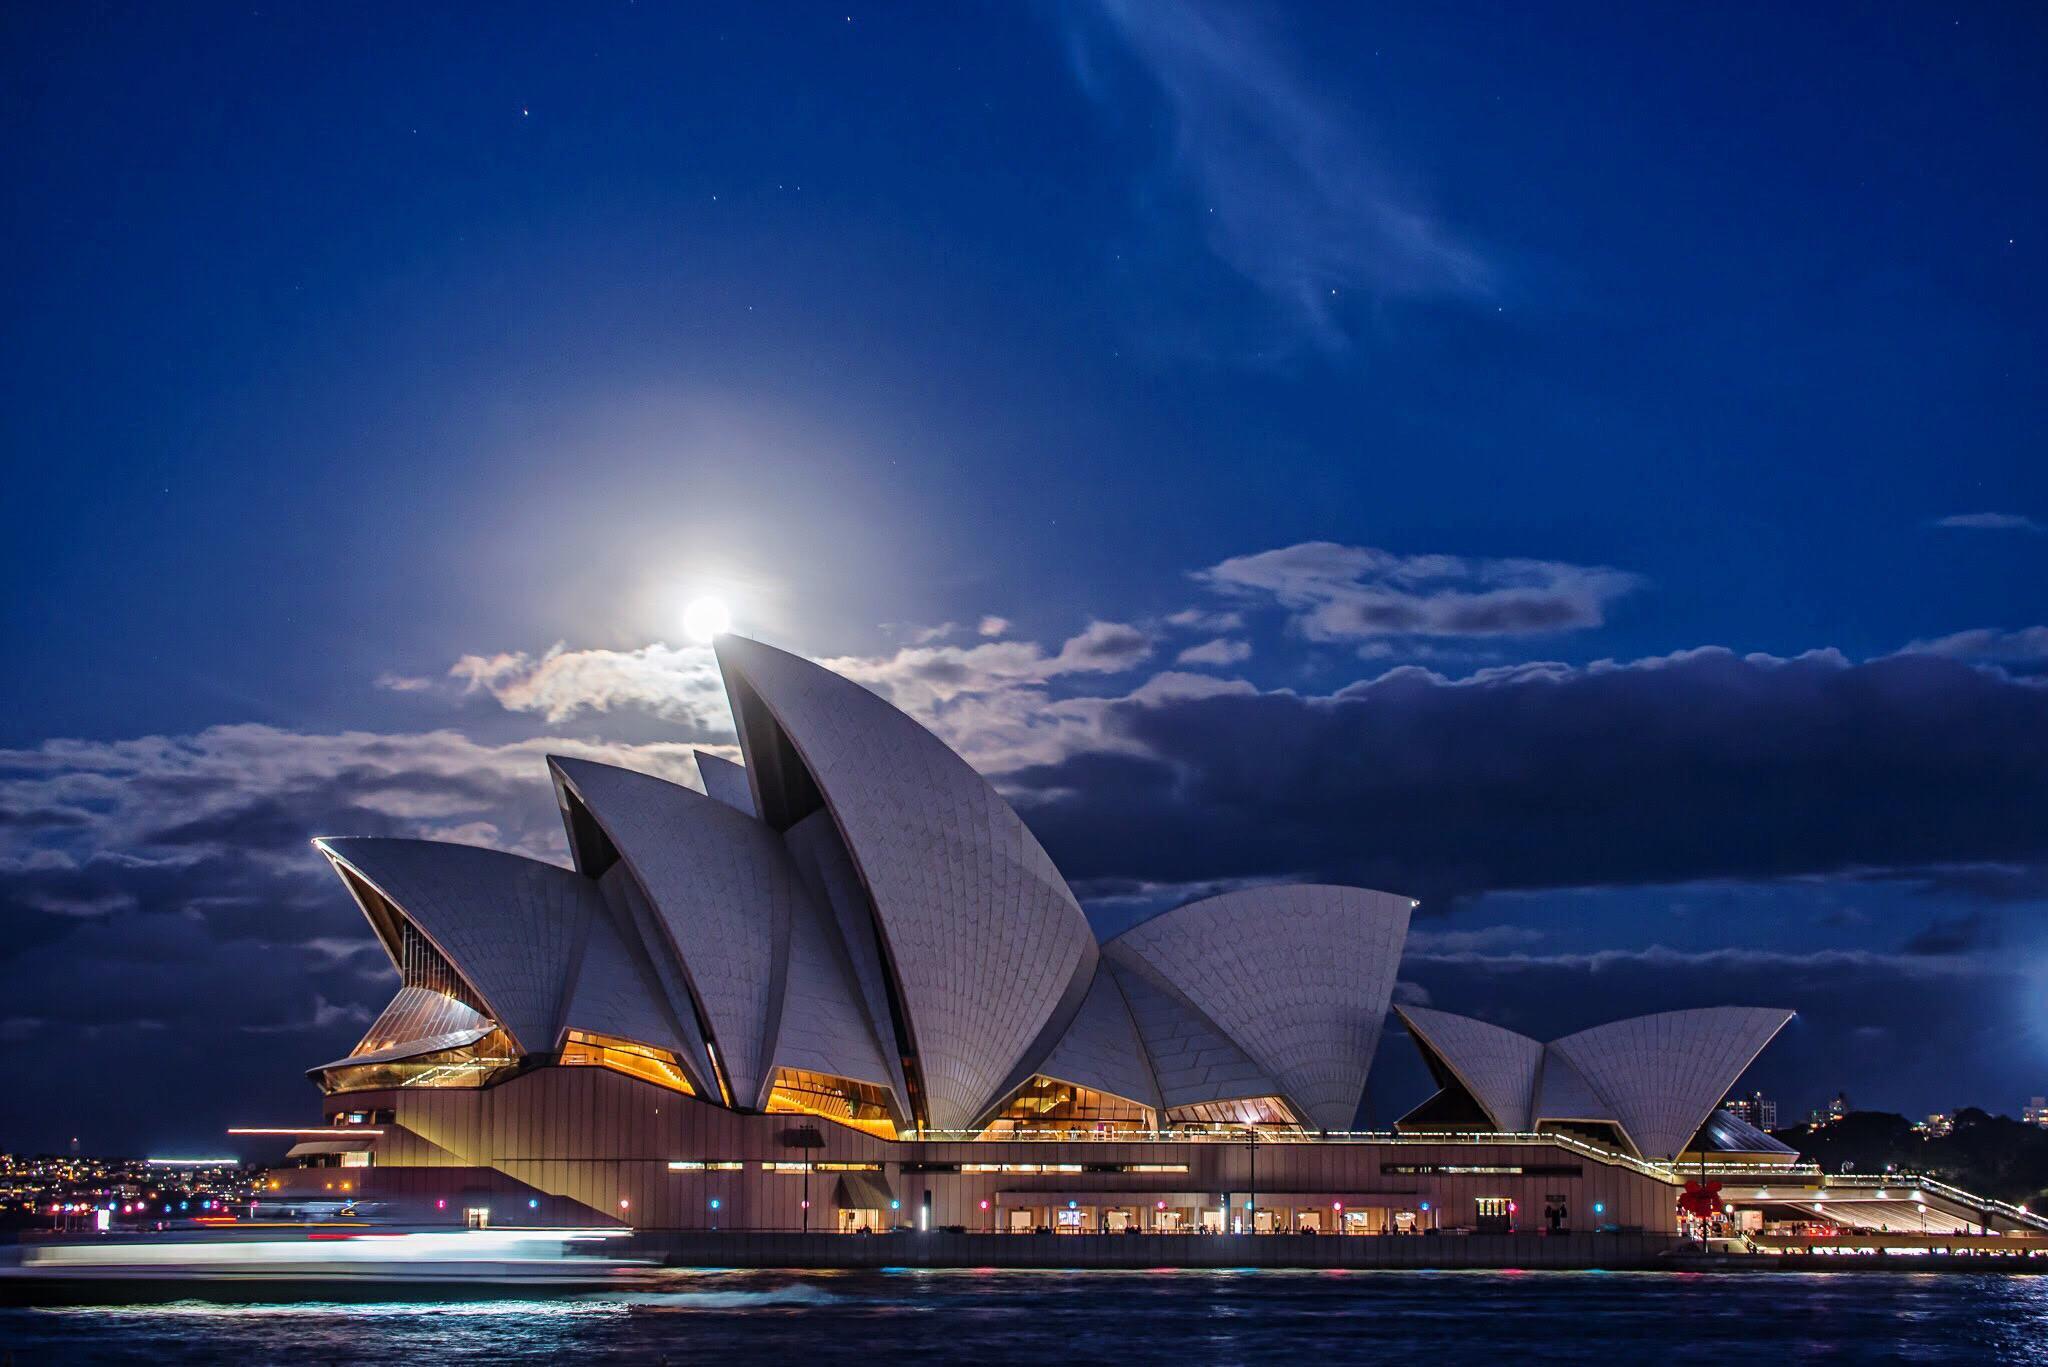 Sydney Opera House under the moonlight